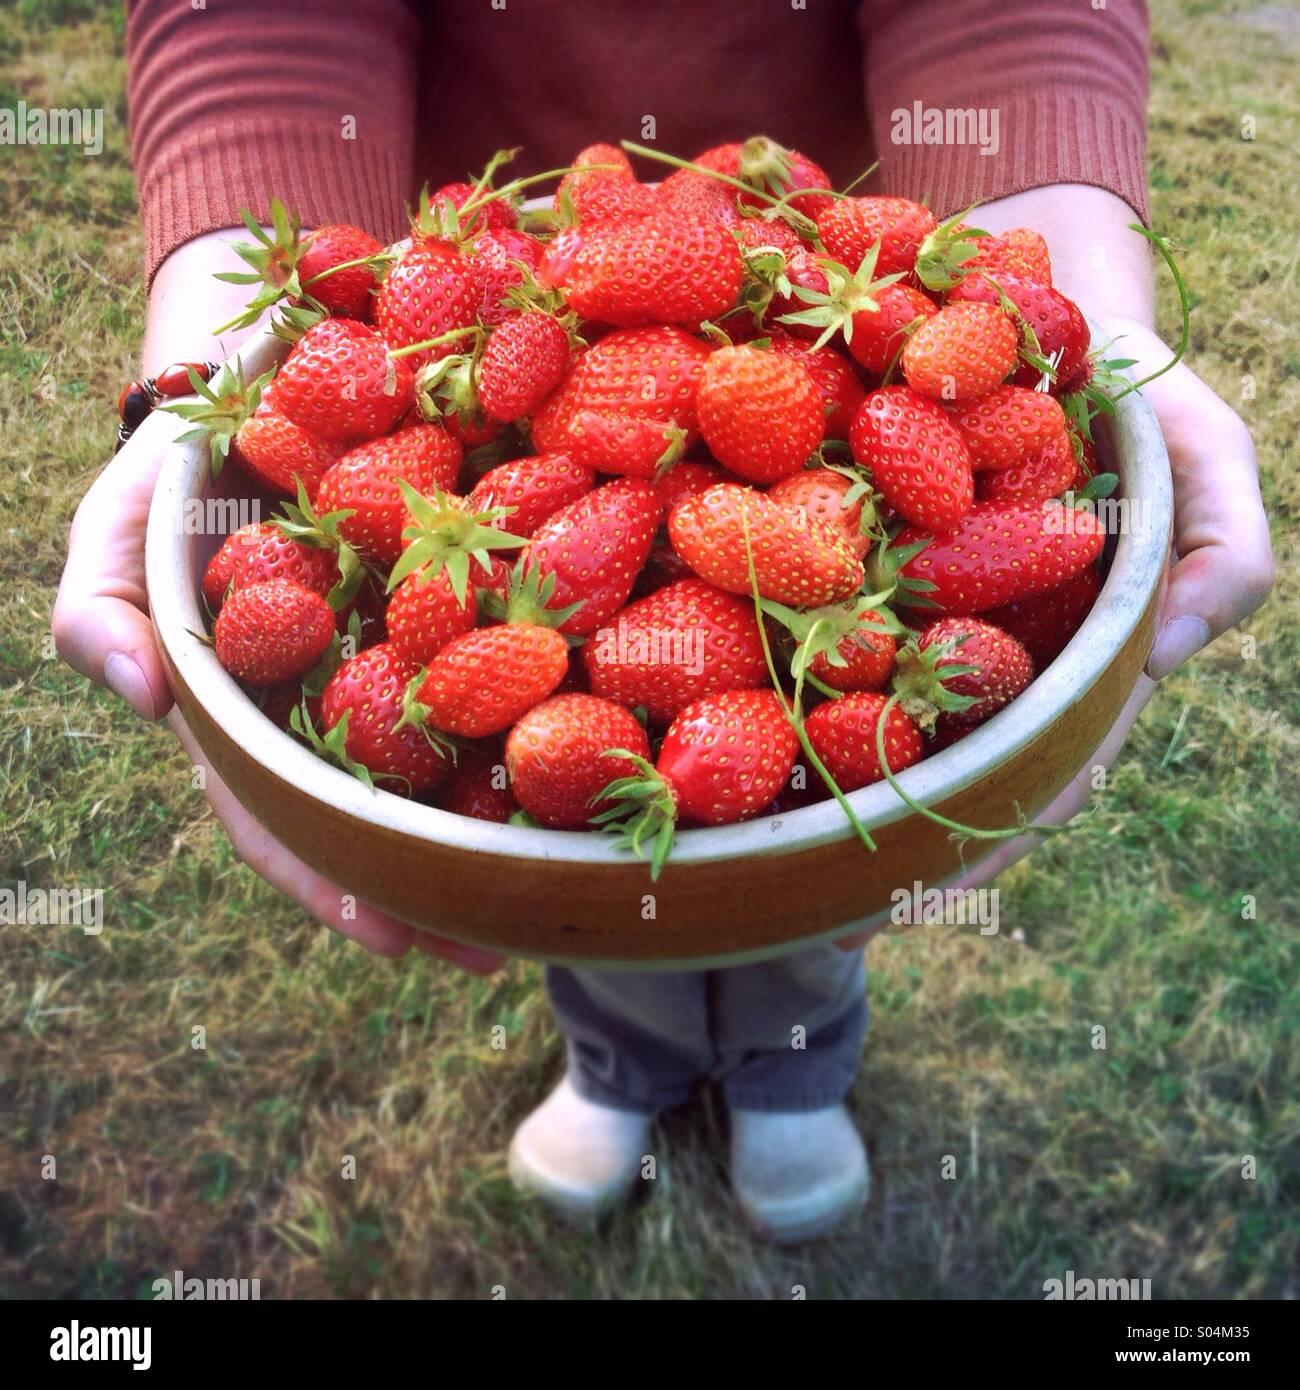 woman-holding-large-bowl-of-freshly-pick